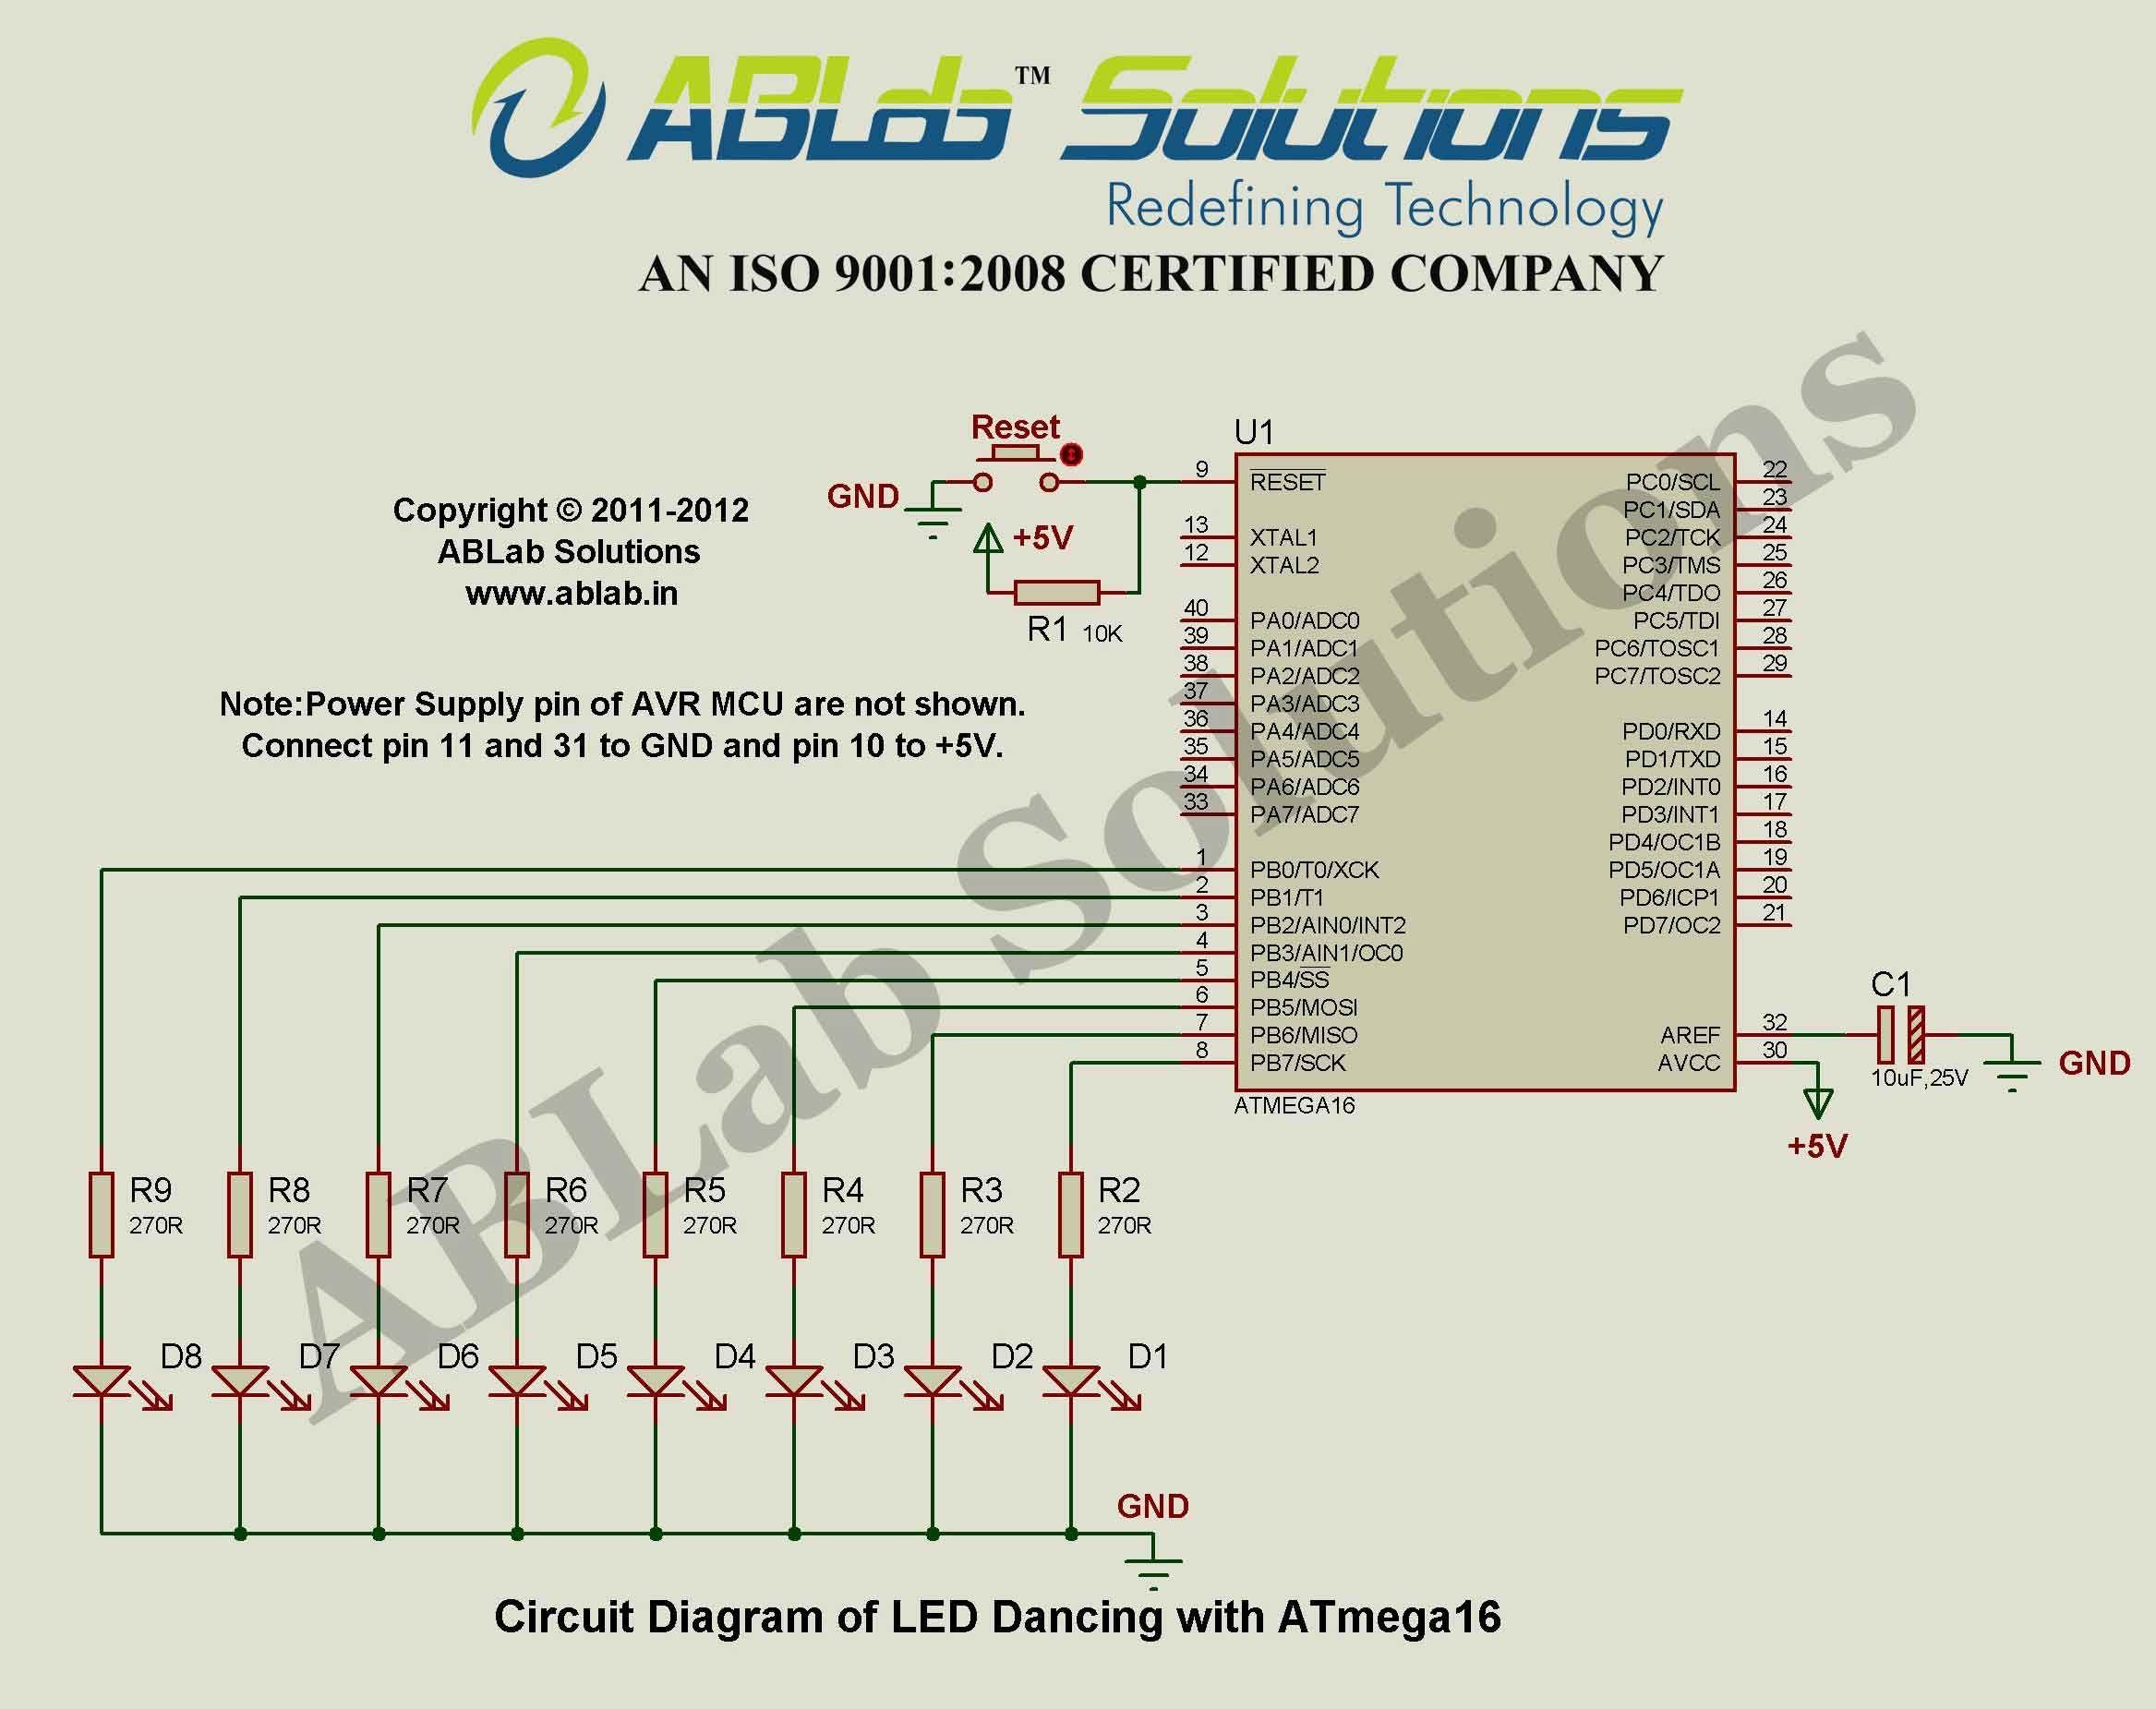 led dancing with avr atmega16 microcontroller circuit diagram ablab solutions [ 2335 x 1851 Pixel ]